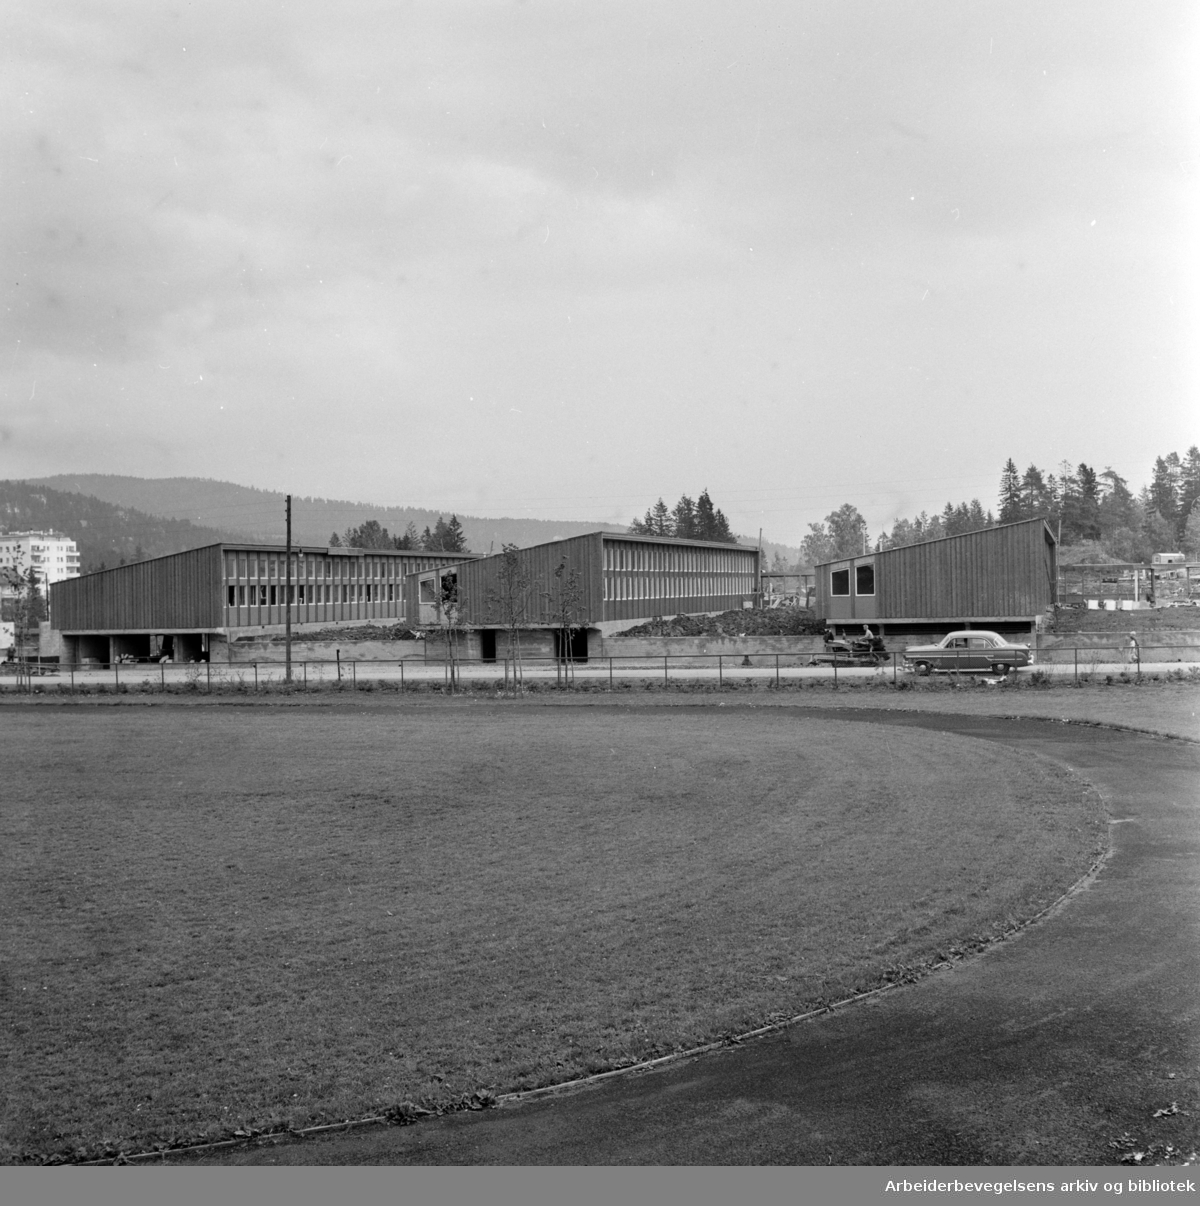 Persbråten skole. August 1959